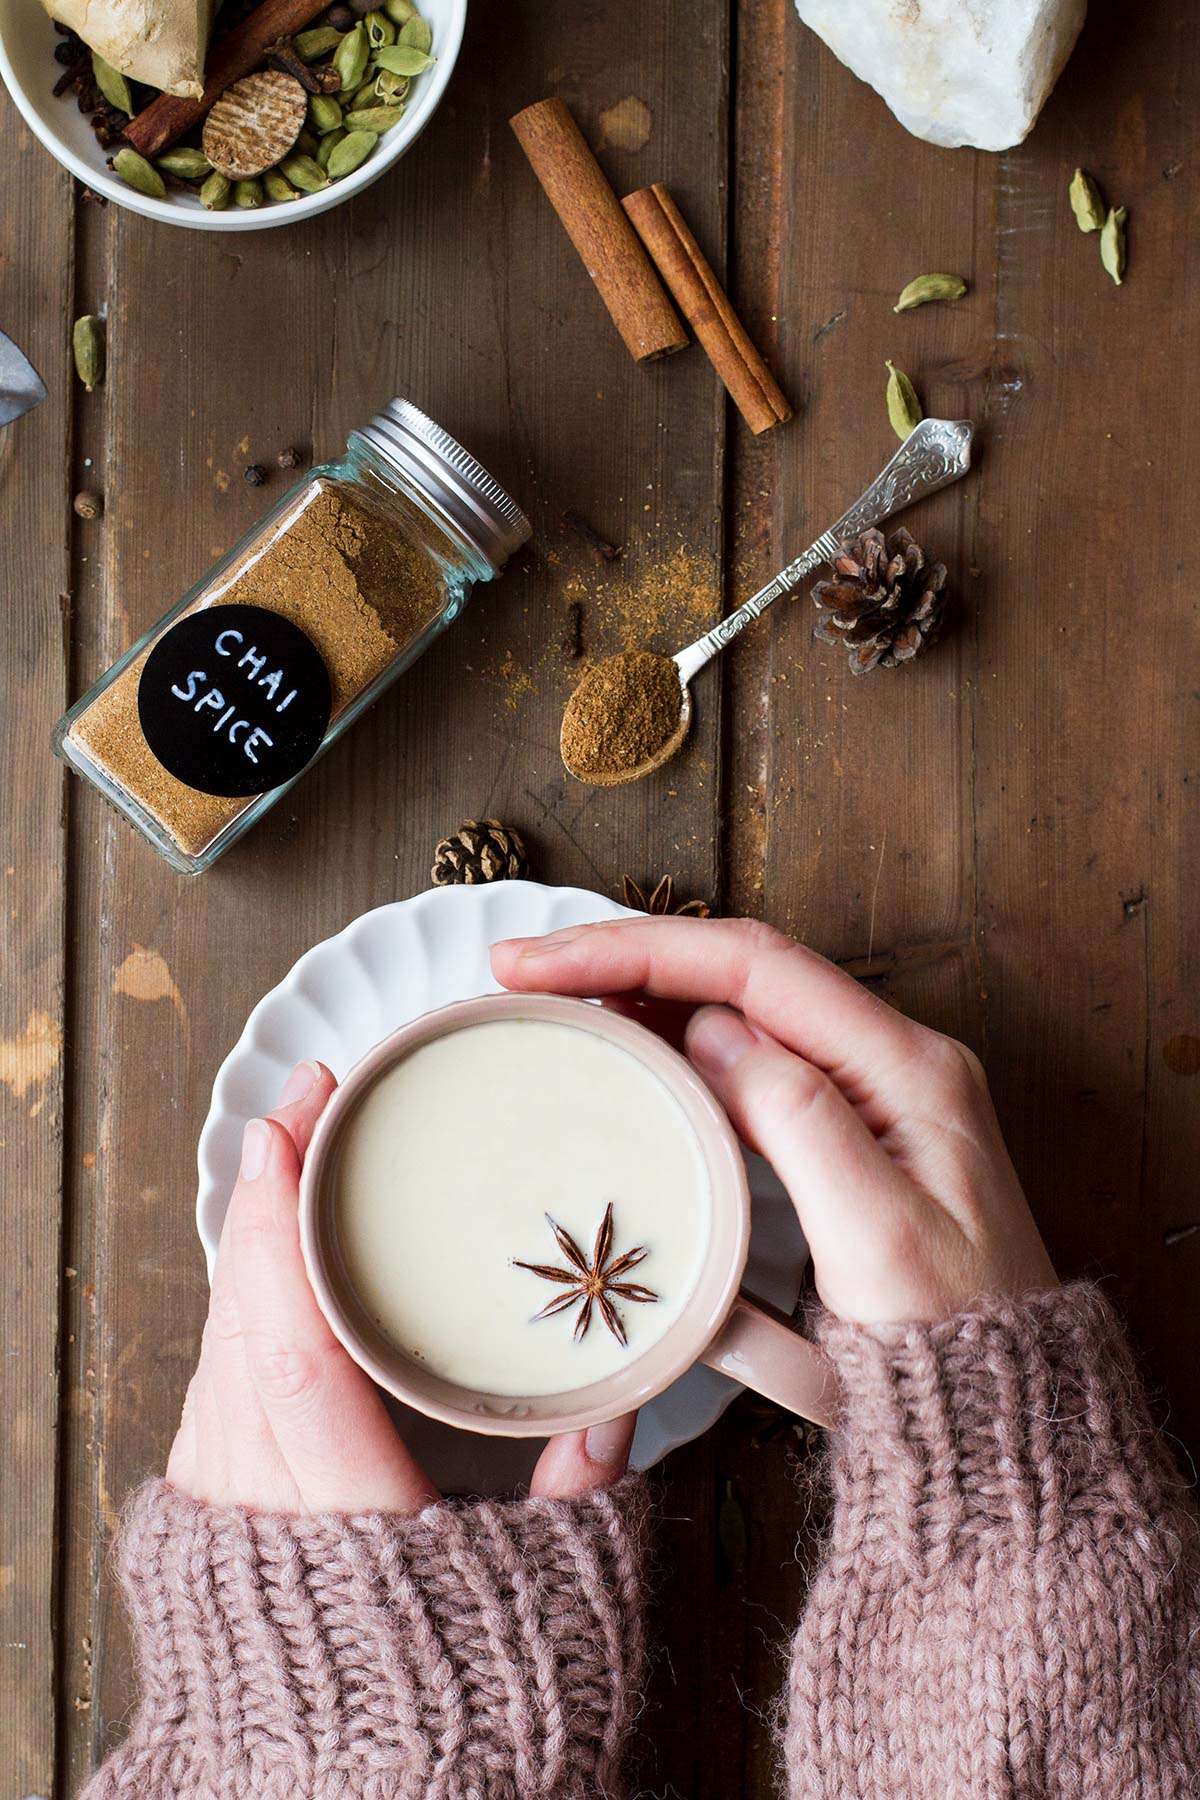 Hands holding a pink mug with chai tea latte.